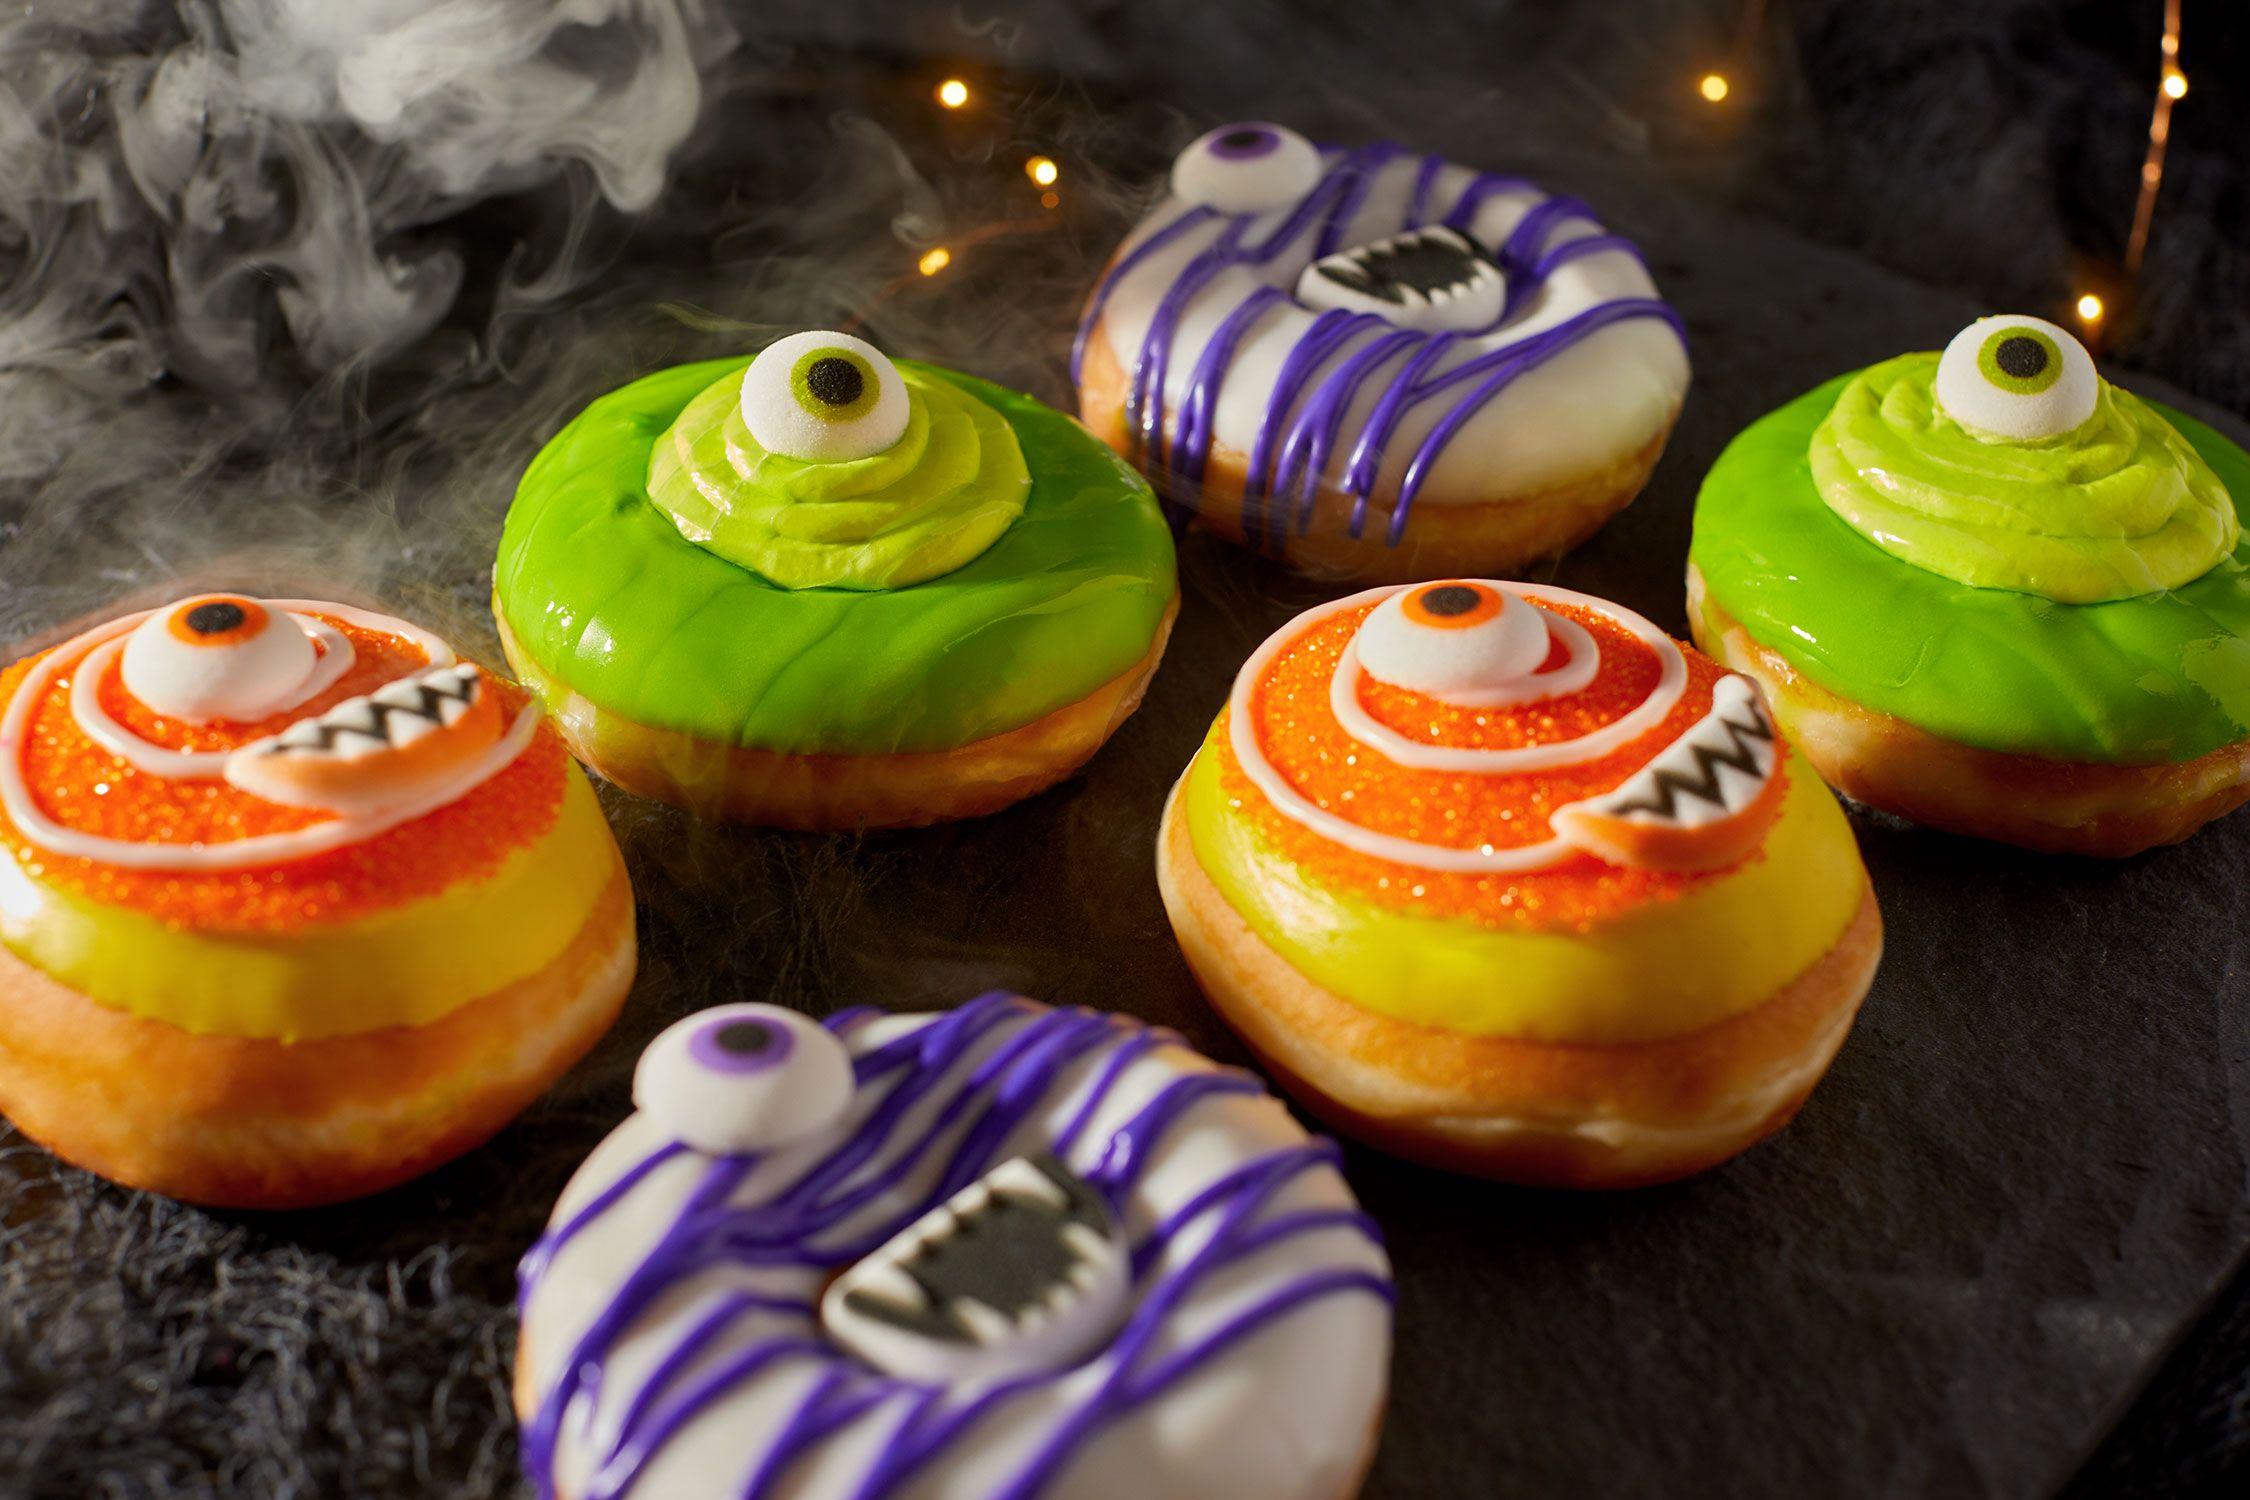 Krispy Kreme Halloween Donuts 2020 Krispy Kreme Has New Halloween Themed Doughnuts